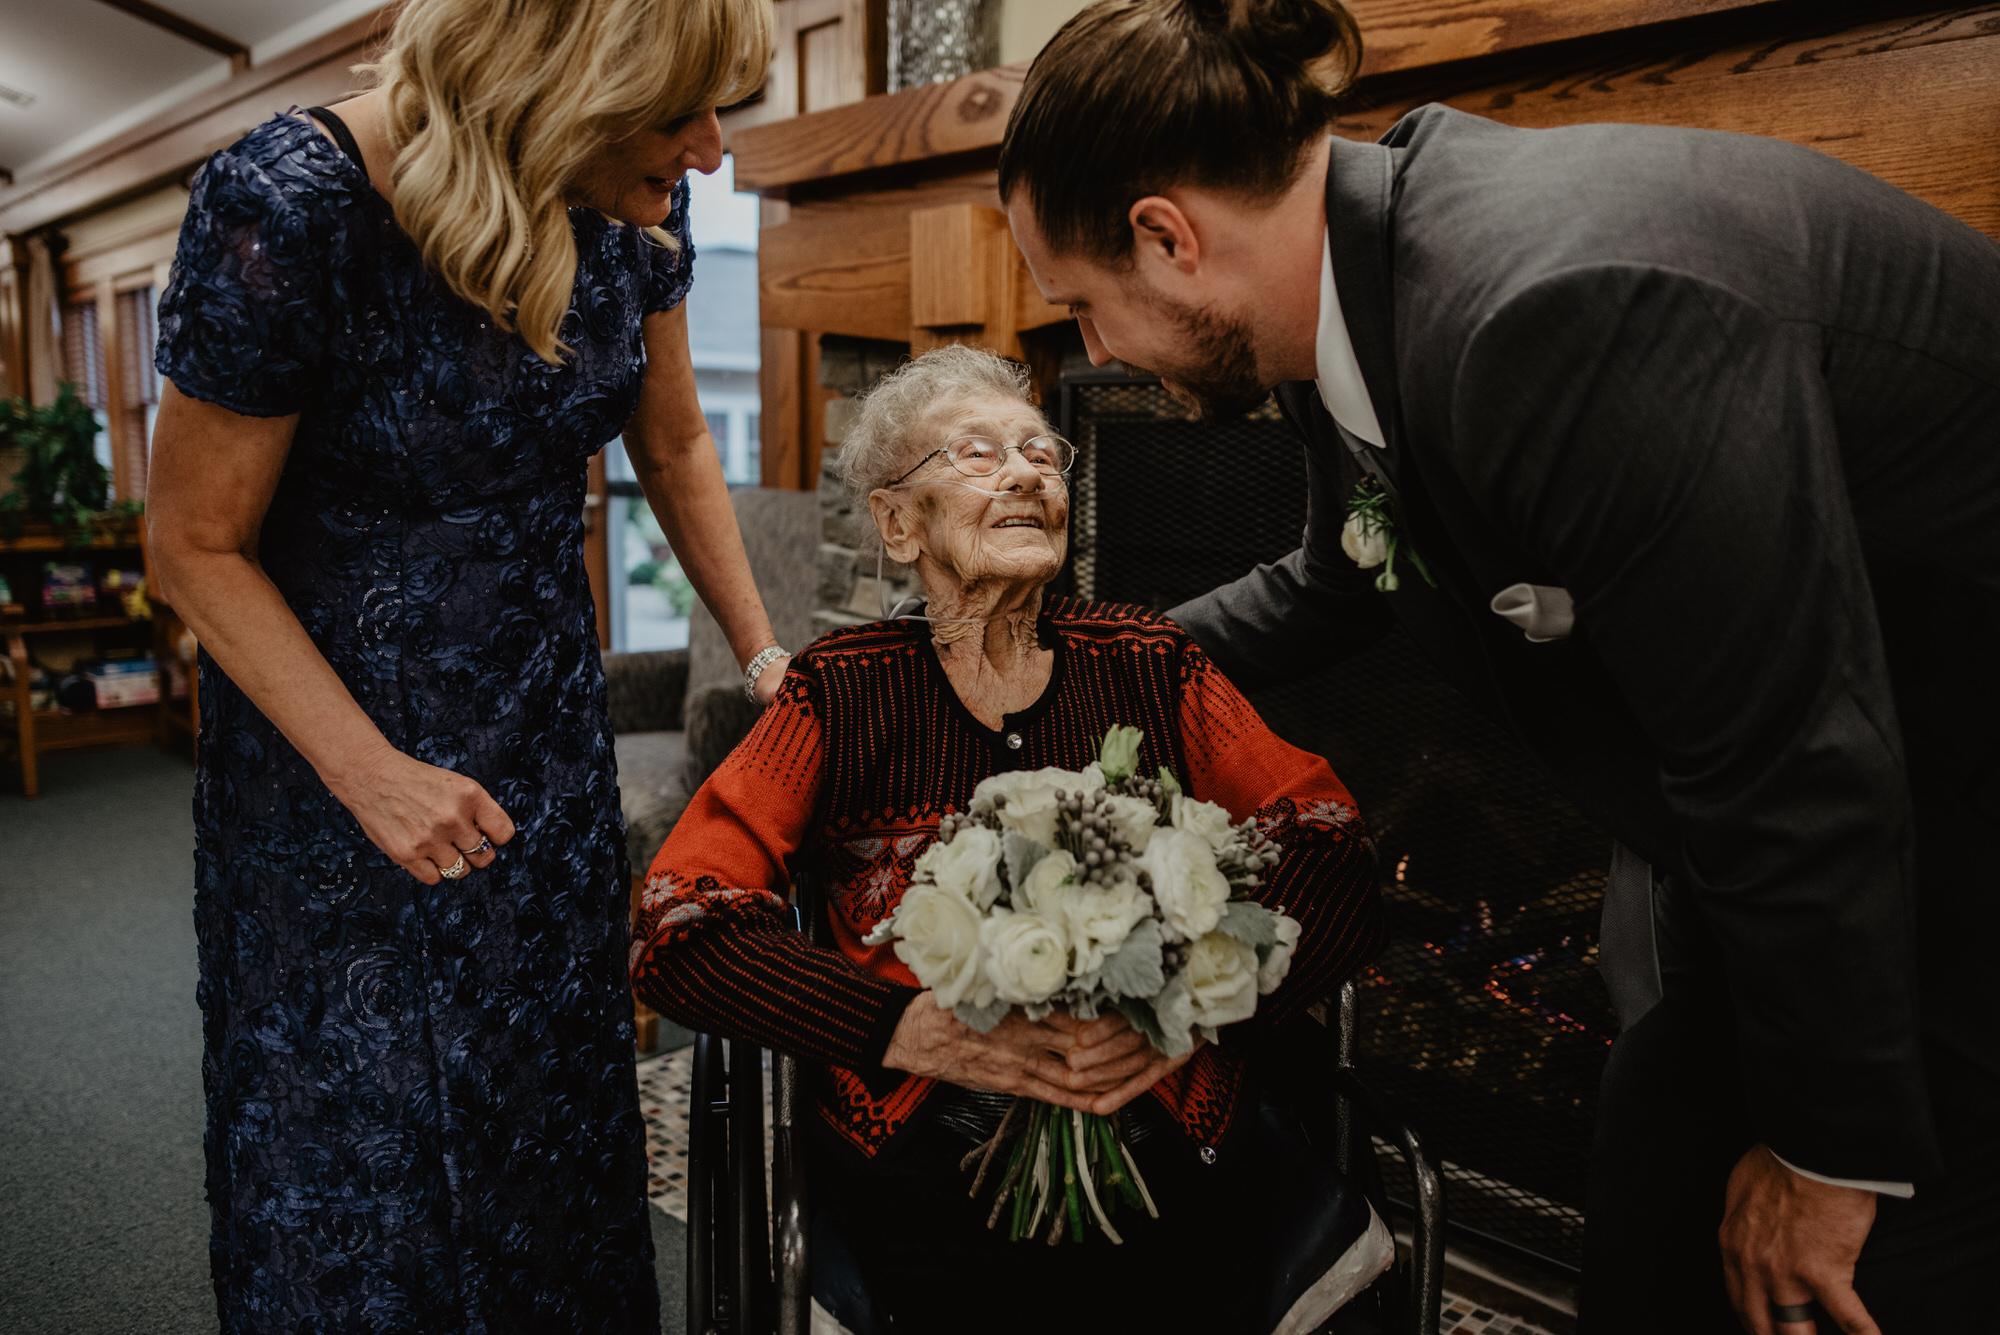 Kaylie_Sirek_Photography_Grand_Island_Kearney_Hastings_Lincoln_Nebraska_Wedding_Engagement_Grandma_Grandparent_Delray_Downtown_DowntownLincoln_LNK_Emotional_Bride_Groom_Photographer_46.jpg